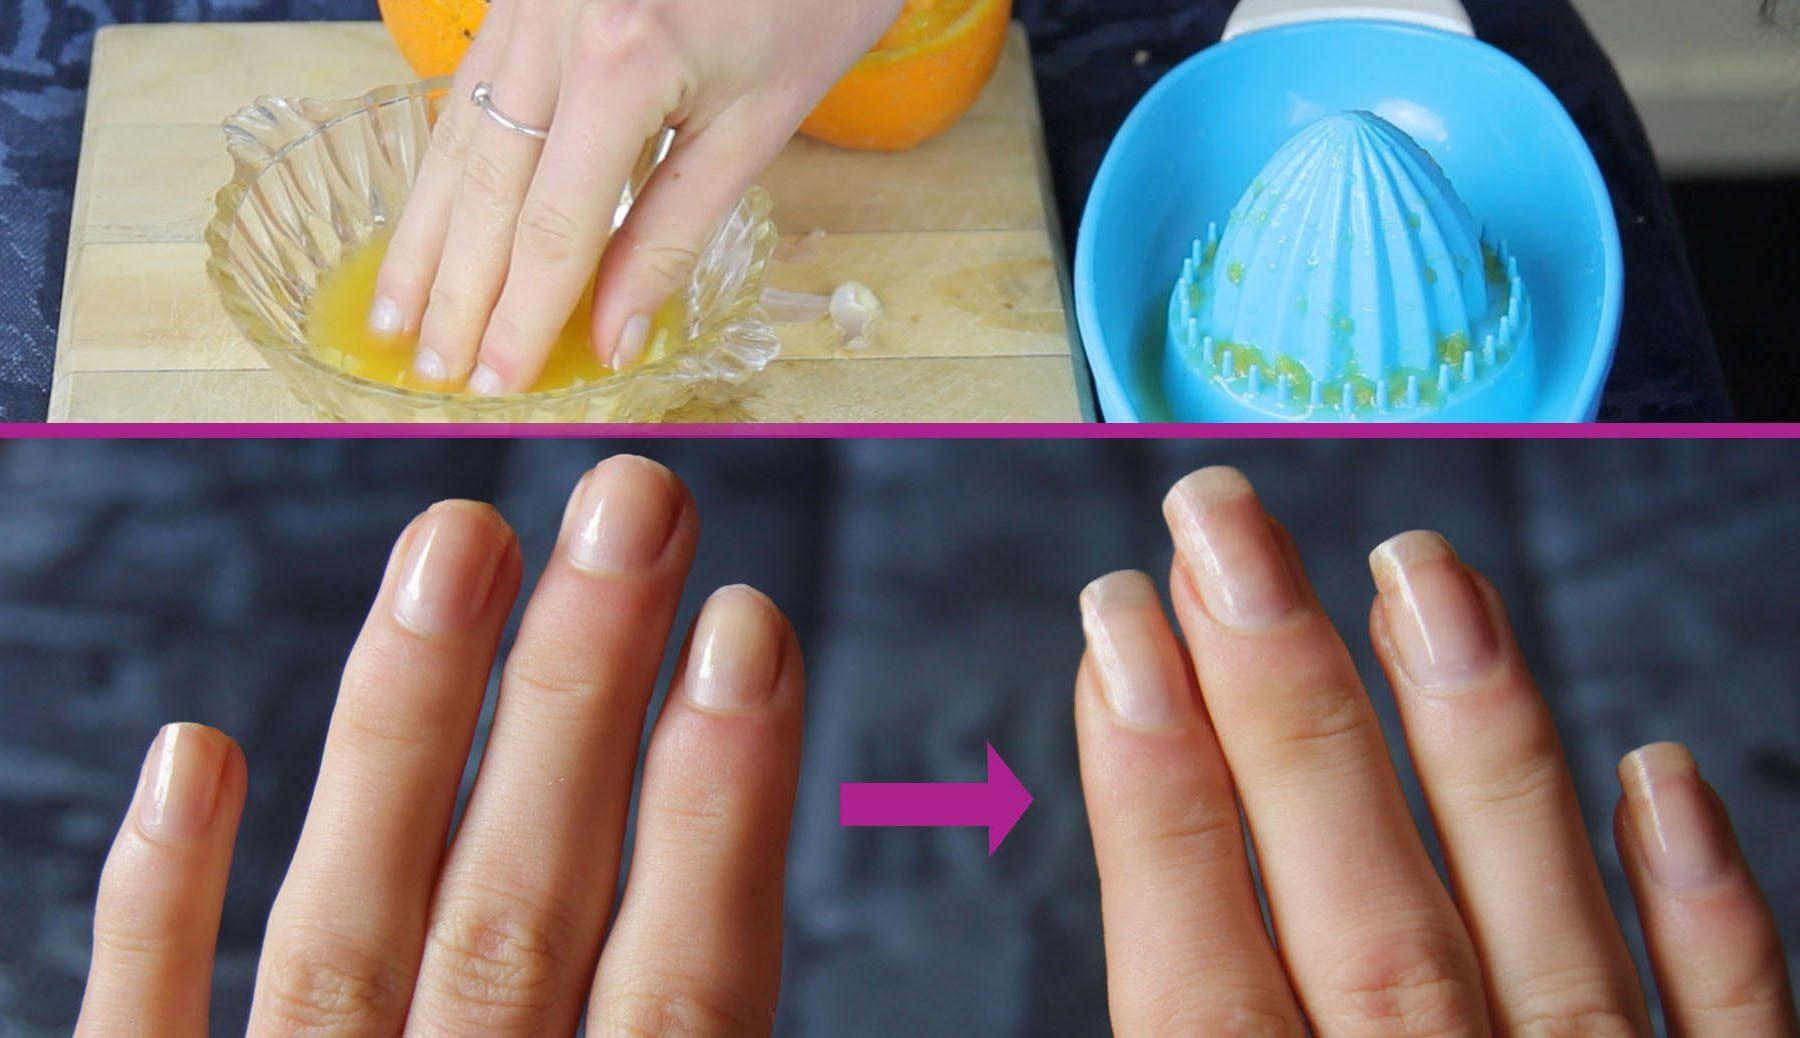 DIY Nail Growth Recipe   DIY BEAUTY   Pinterest   Marvel, Oil and Guy